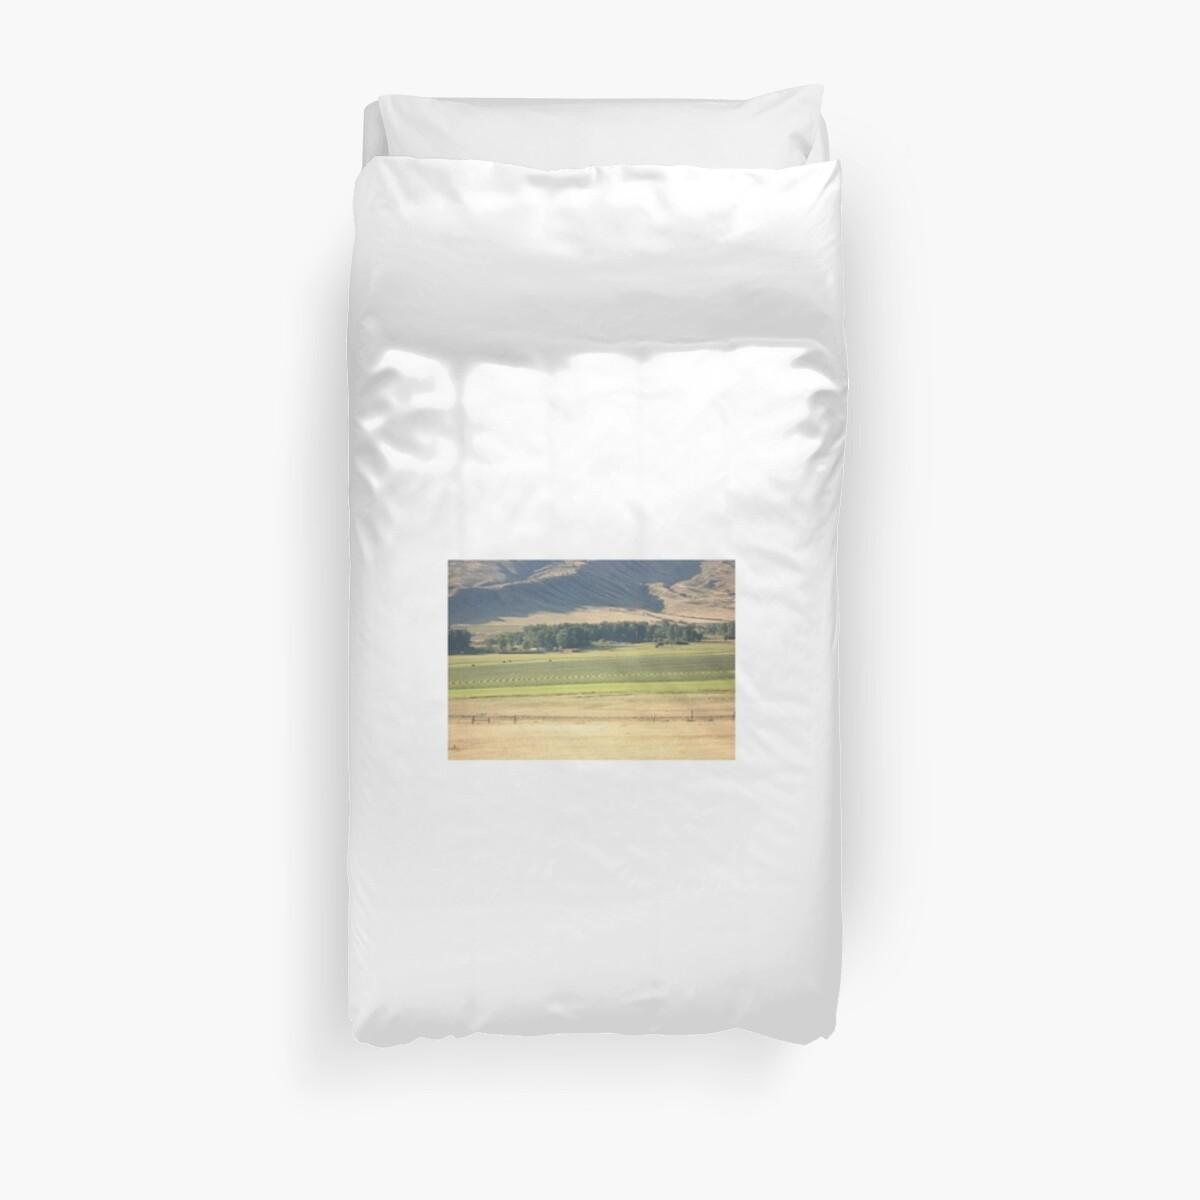 Alfalfa Field in Montana by May Lattanzio